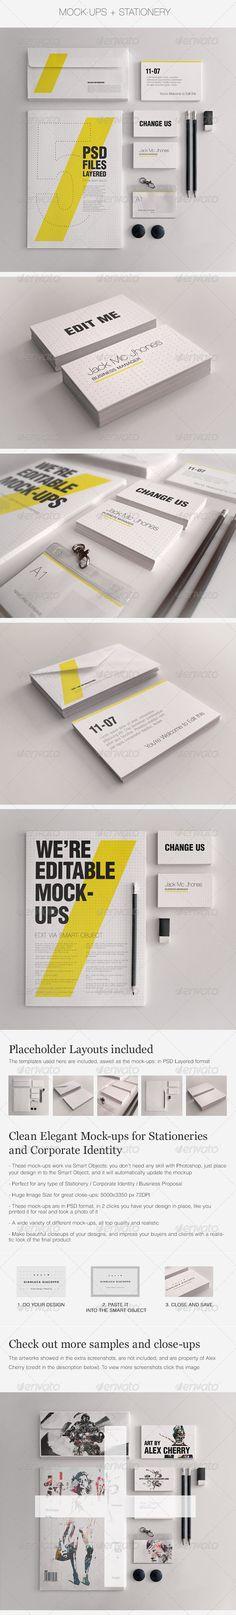 presentation-GR-Showcase-business-fashion-mockup-psd-3d-layered-stationery-letter-corporate-set